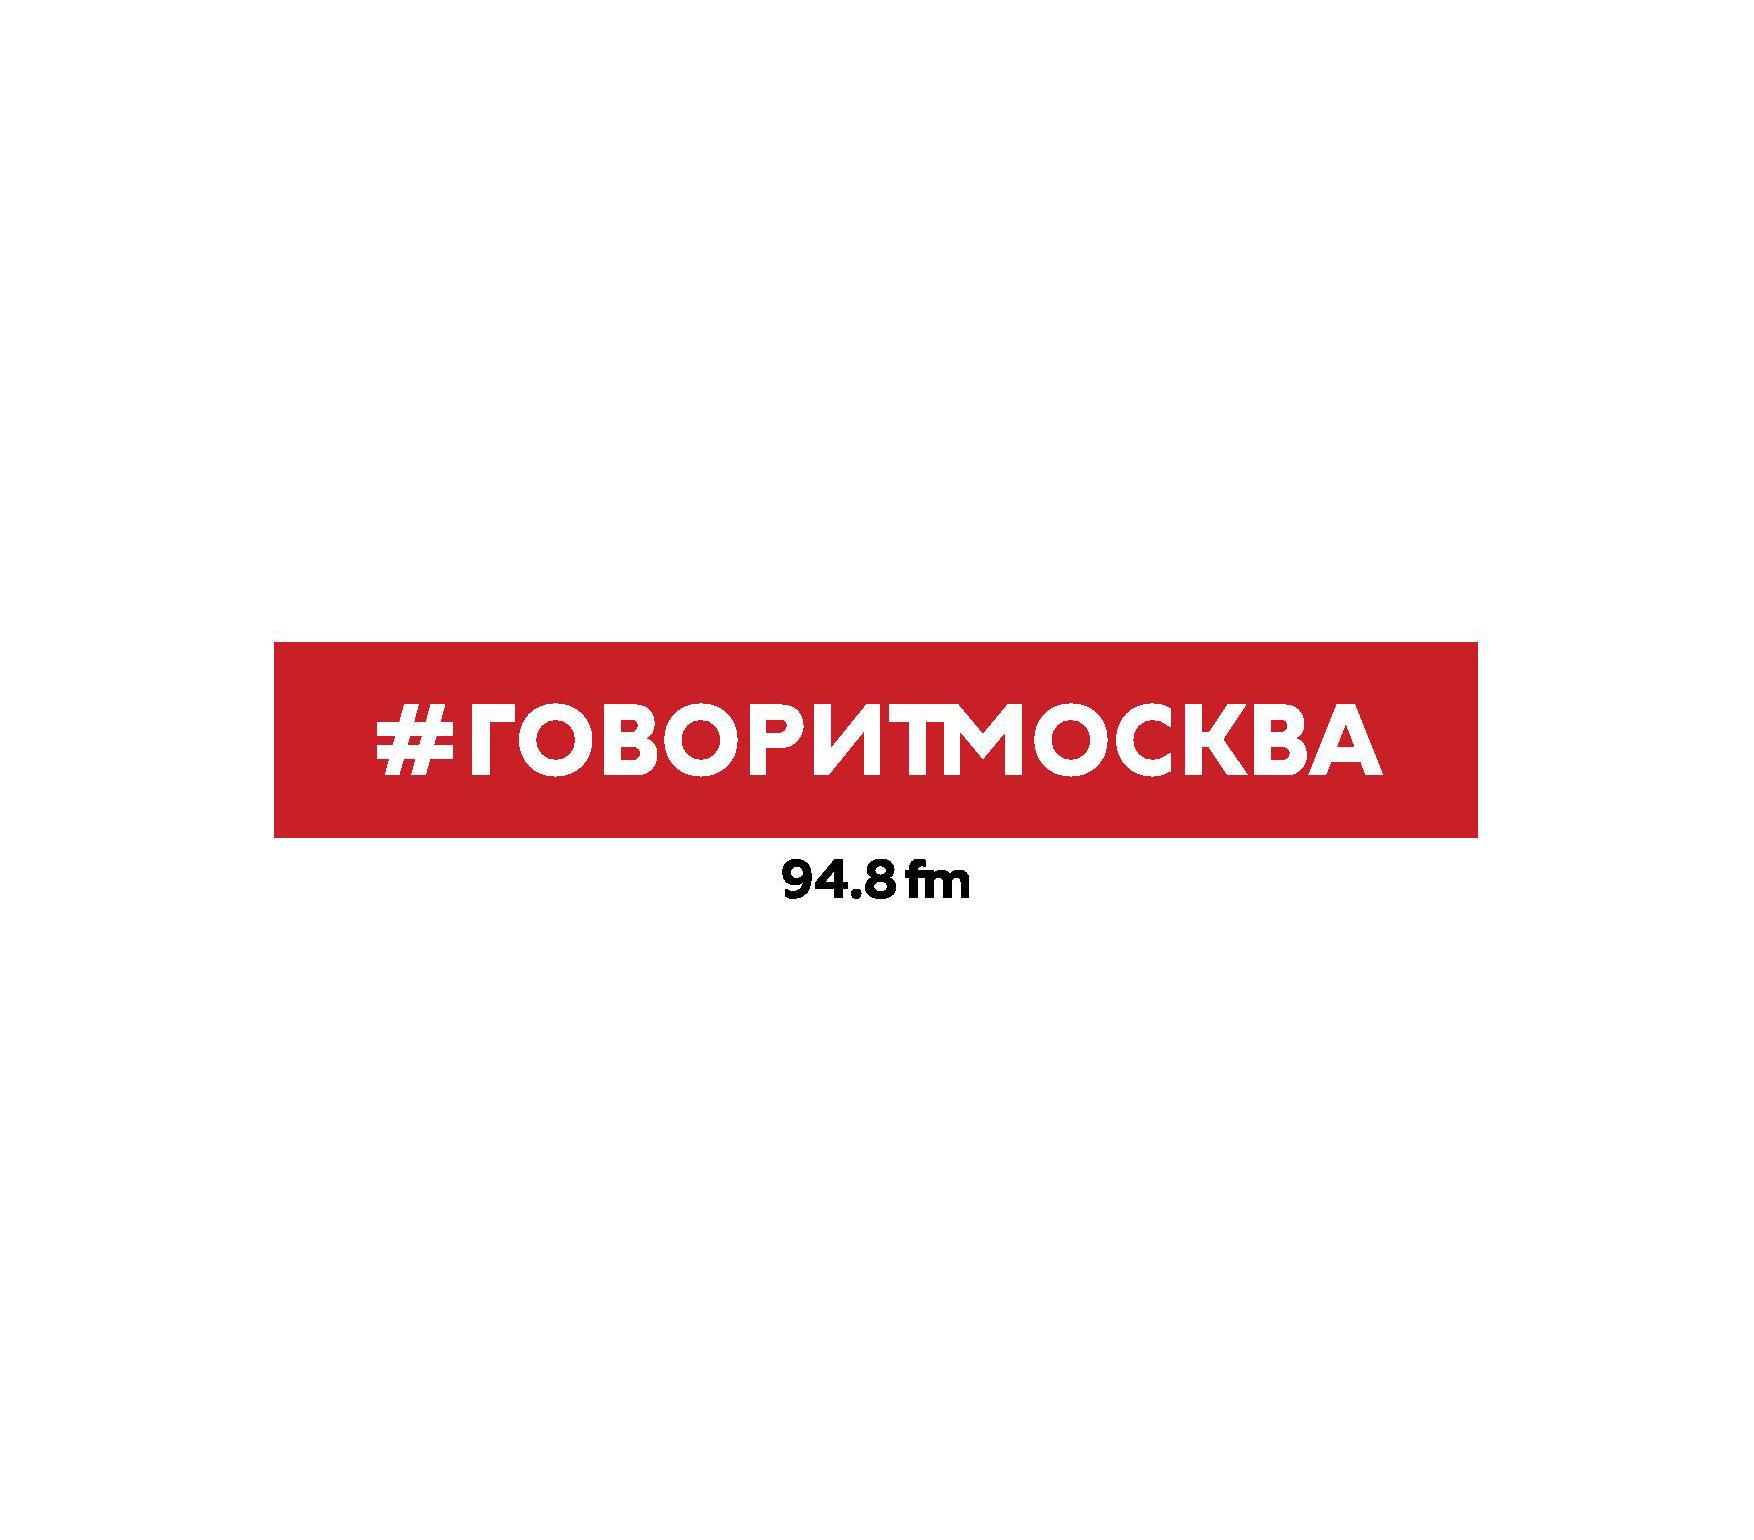 Станислав Симонов Московский Кремль станислав симонов хитровка